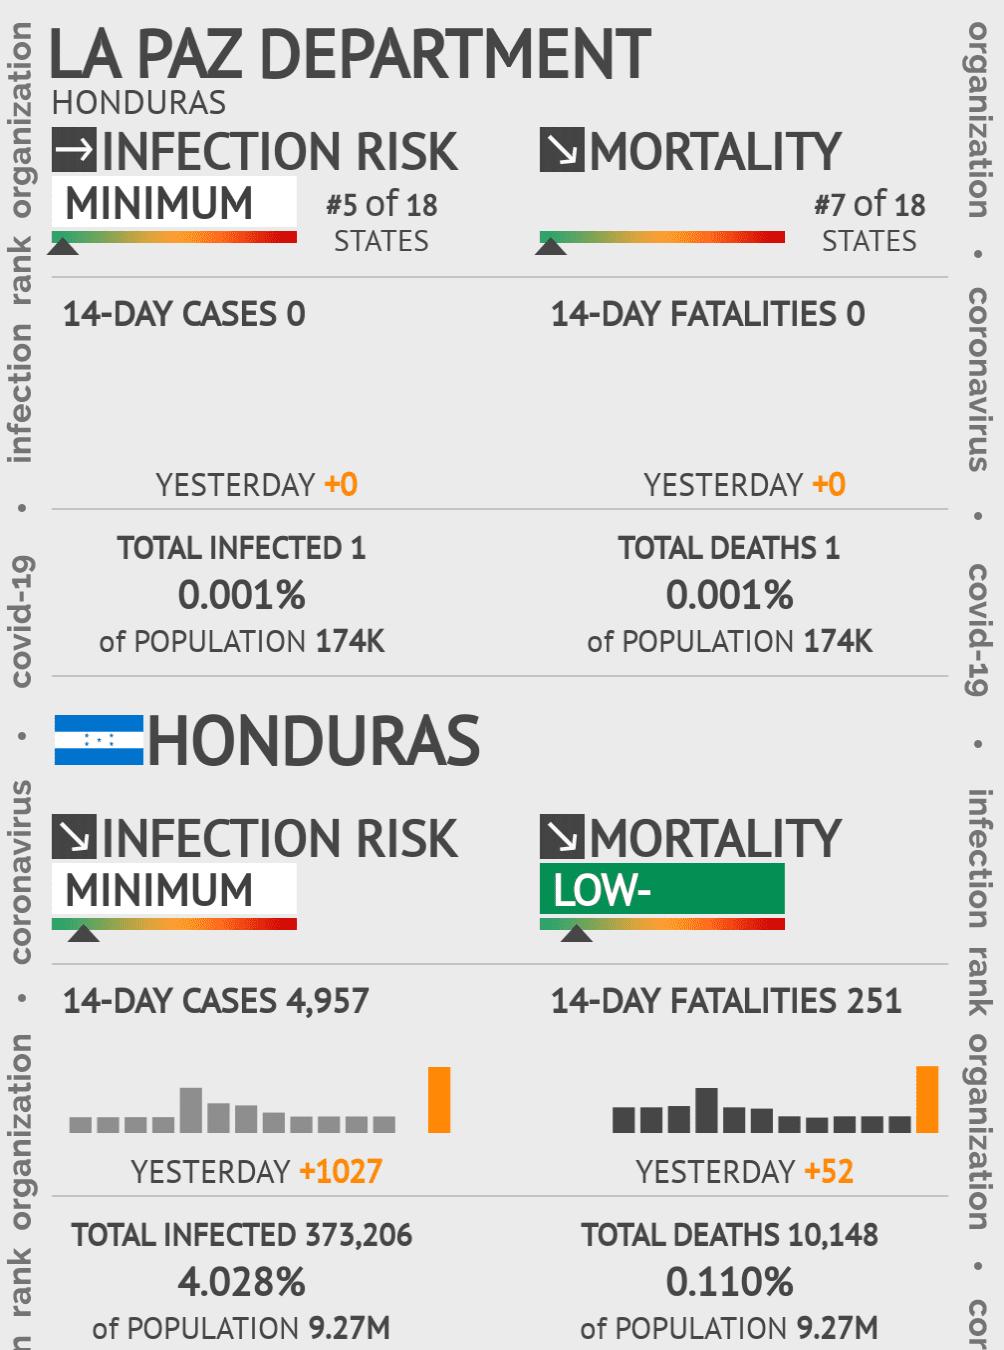 La Paz Coronavirus Covid-19 Risk of Infection on December 05, 2020